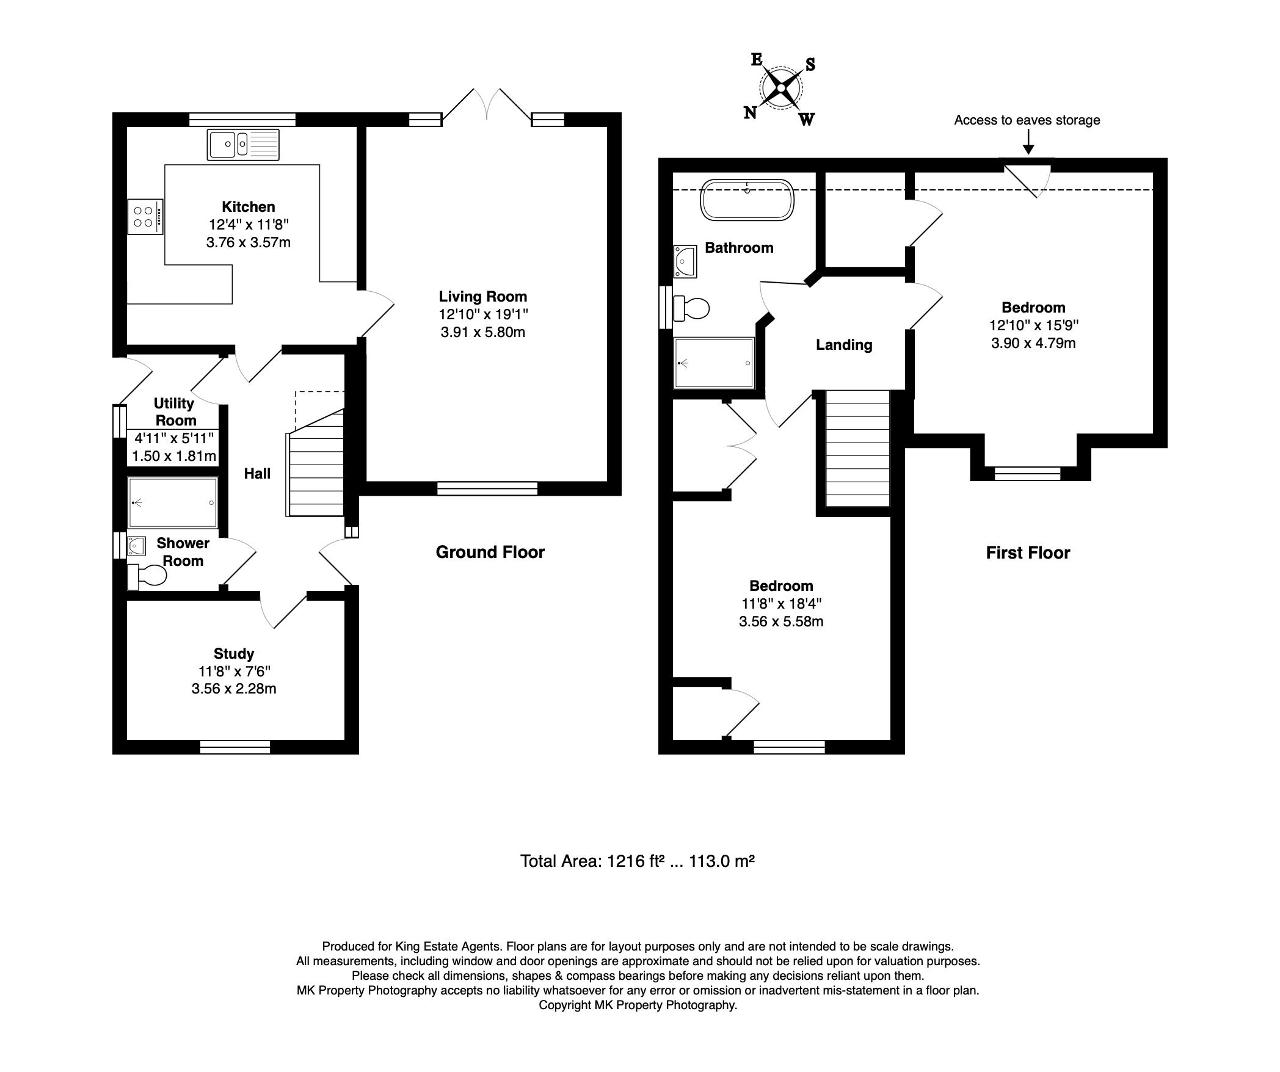 Floorplan for St. Matthews Court, Bletchley, Milton Keynes, Buckinghamshire, MK3 5PD